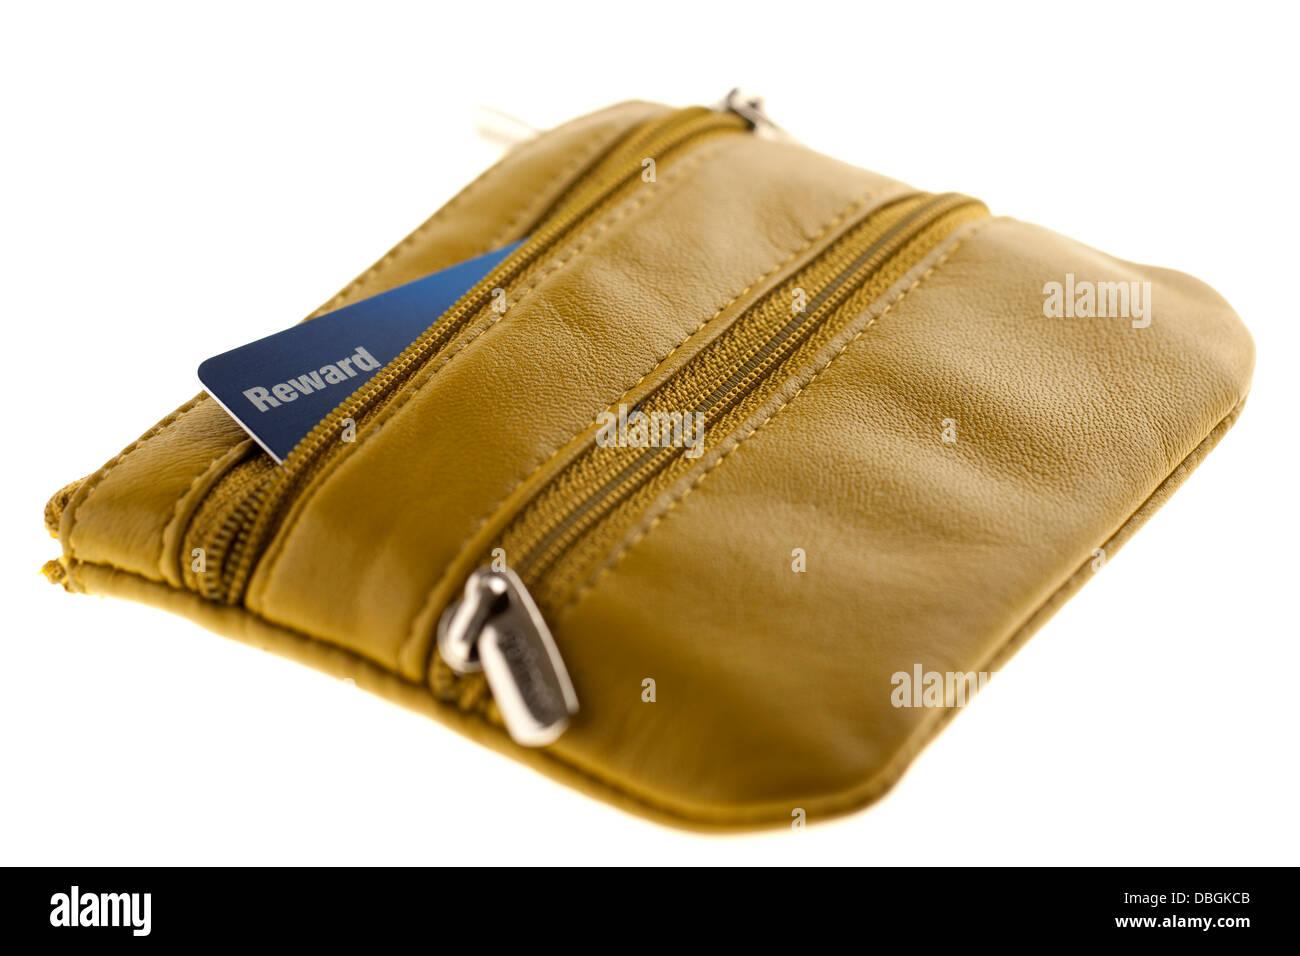 Reward card in a yellow zipped purse - Stock Image